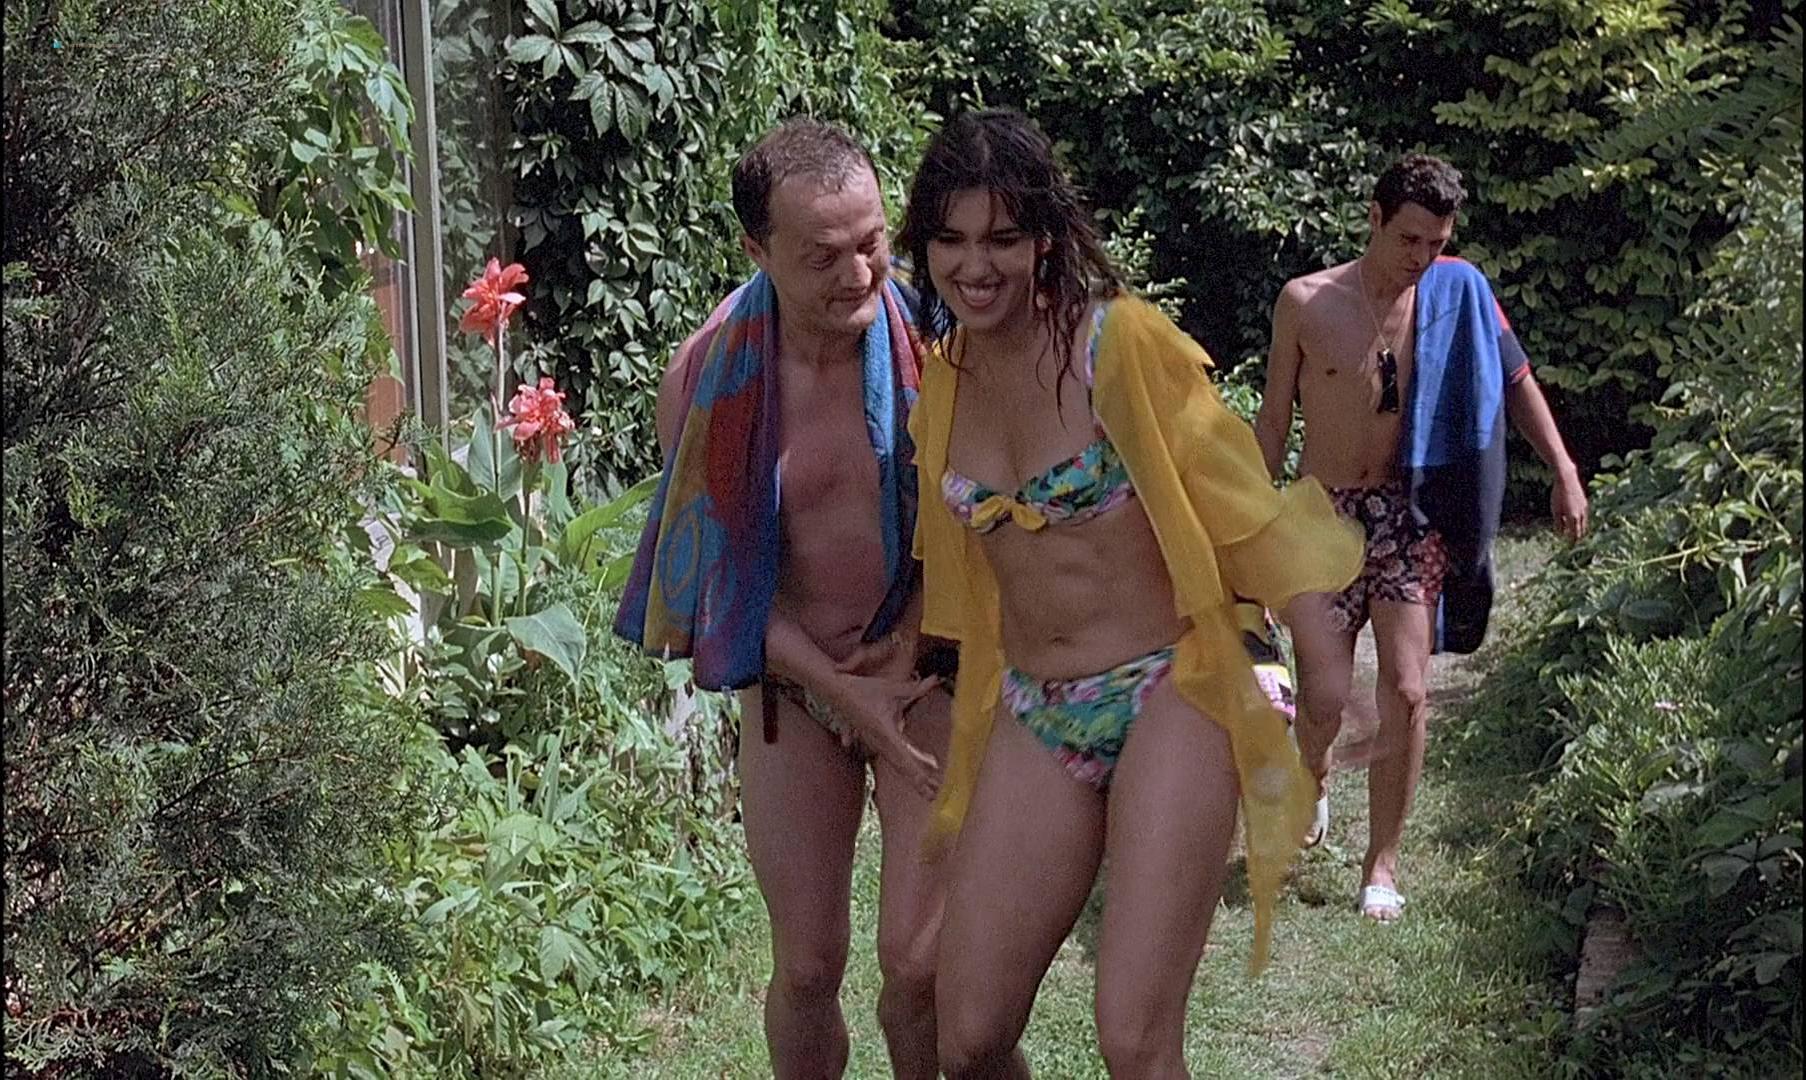 Emmanuelle Beart sexy, Nathalie Cardone sexy - L'Enfer (1994)